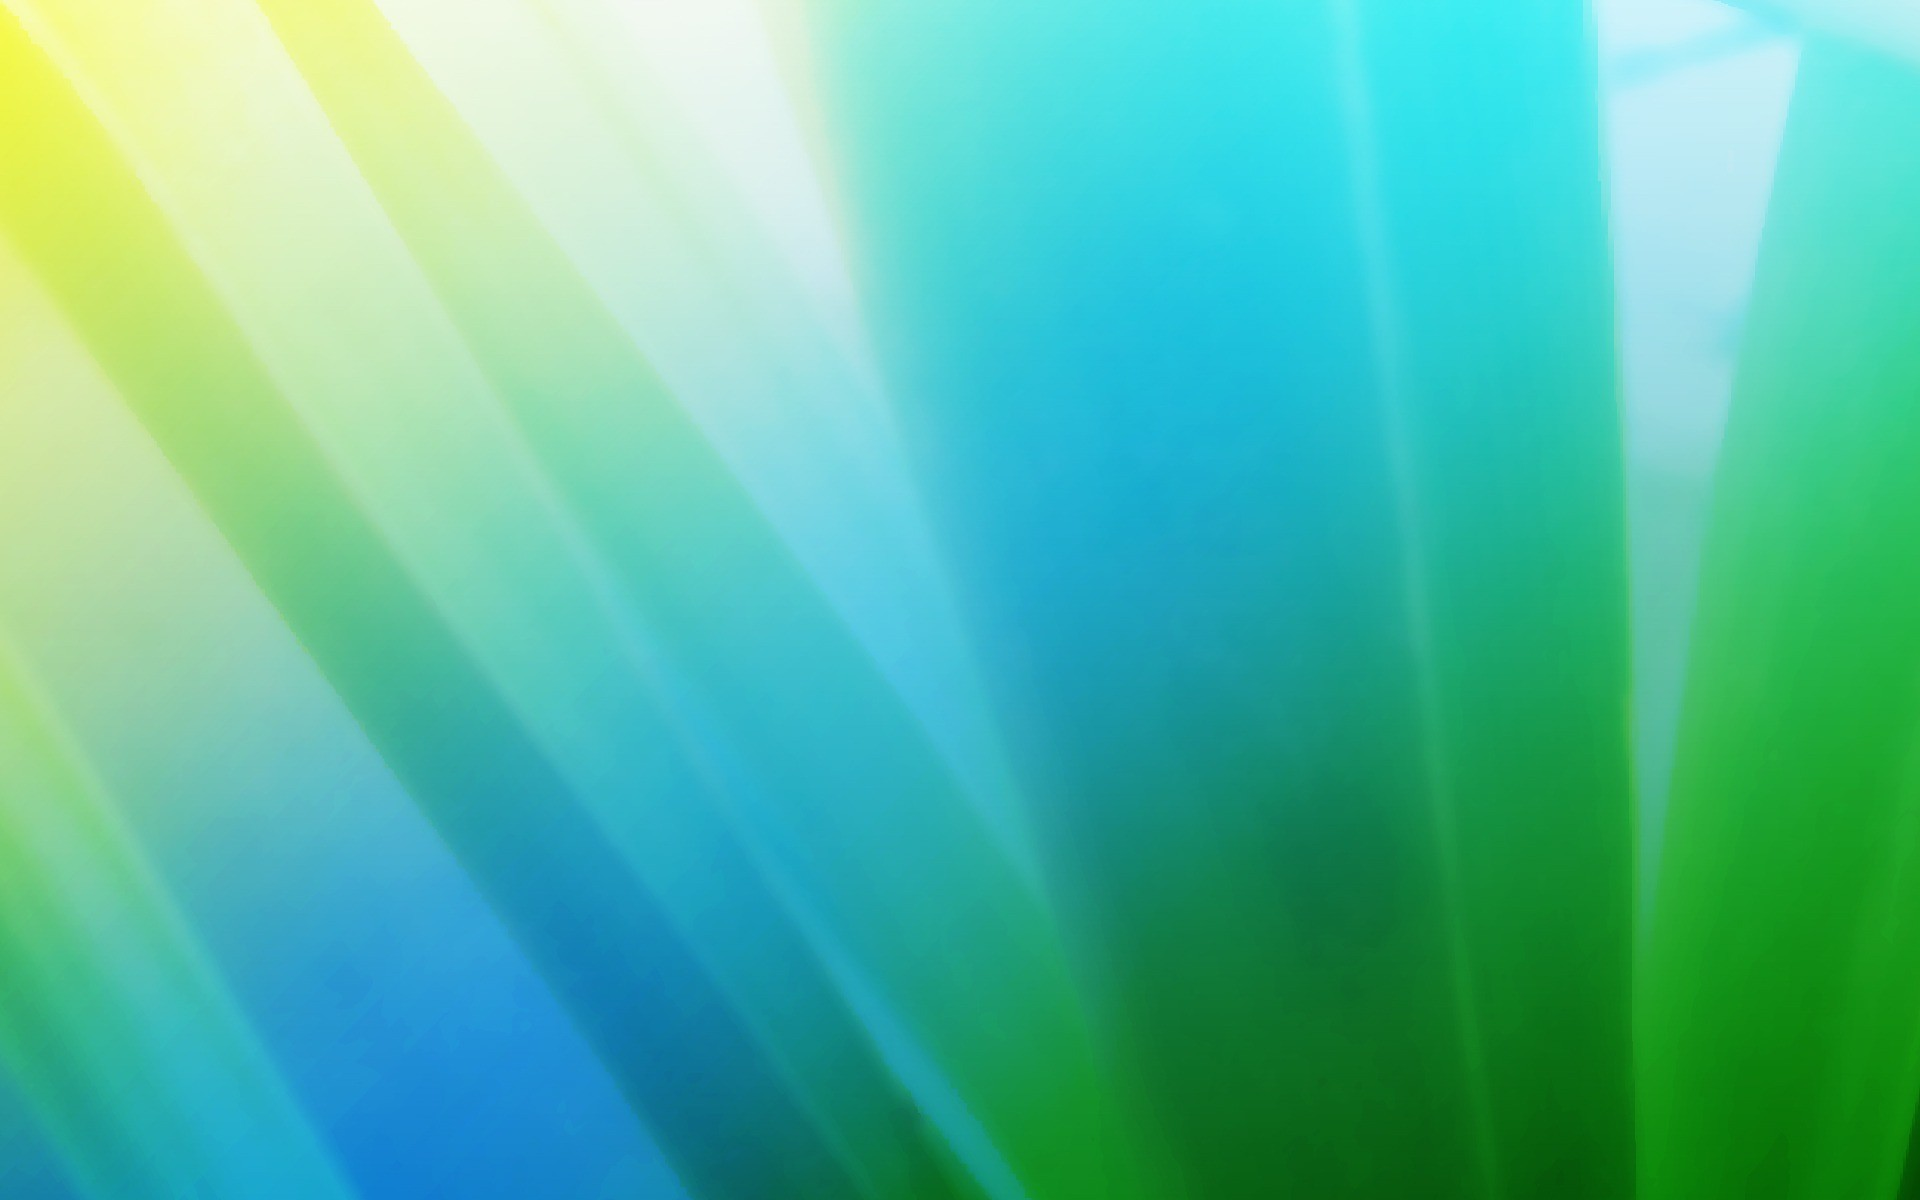 Bright color background wallpaper